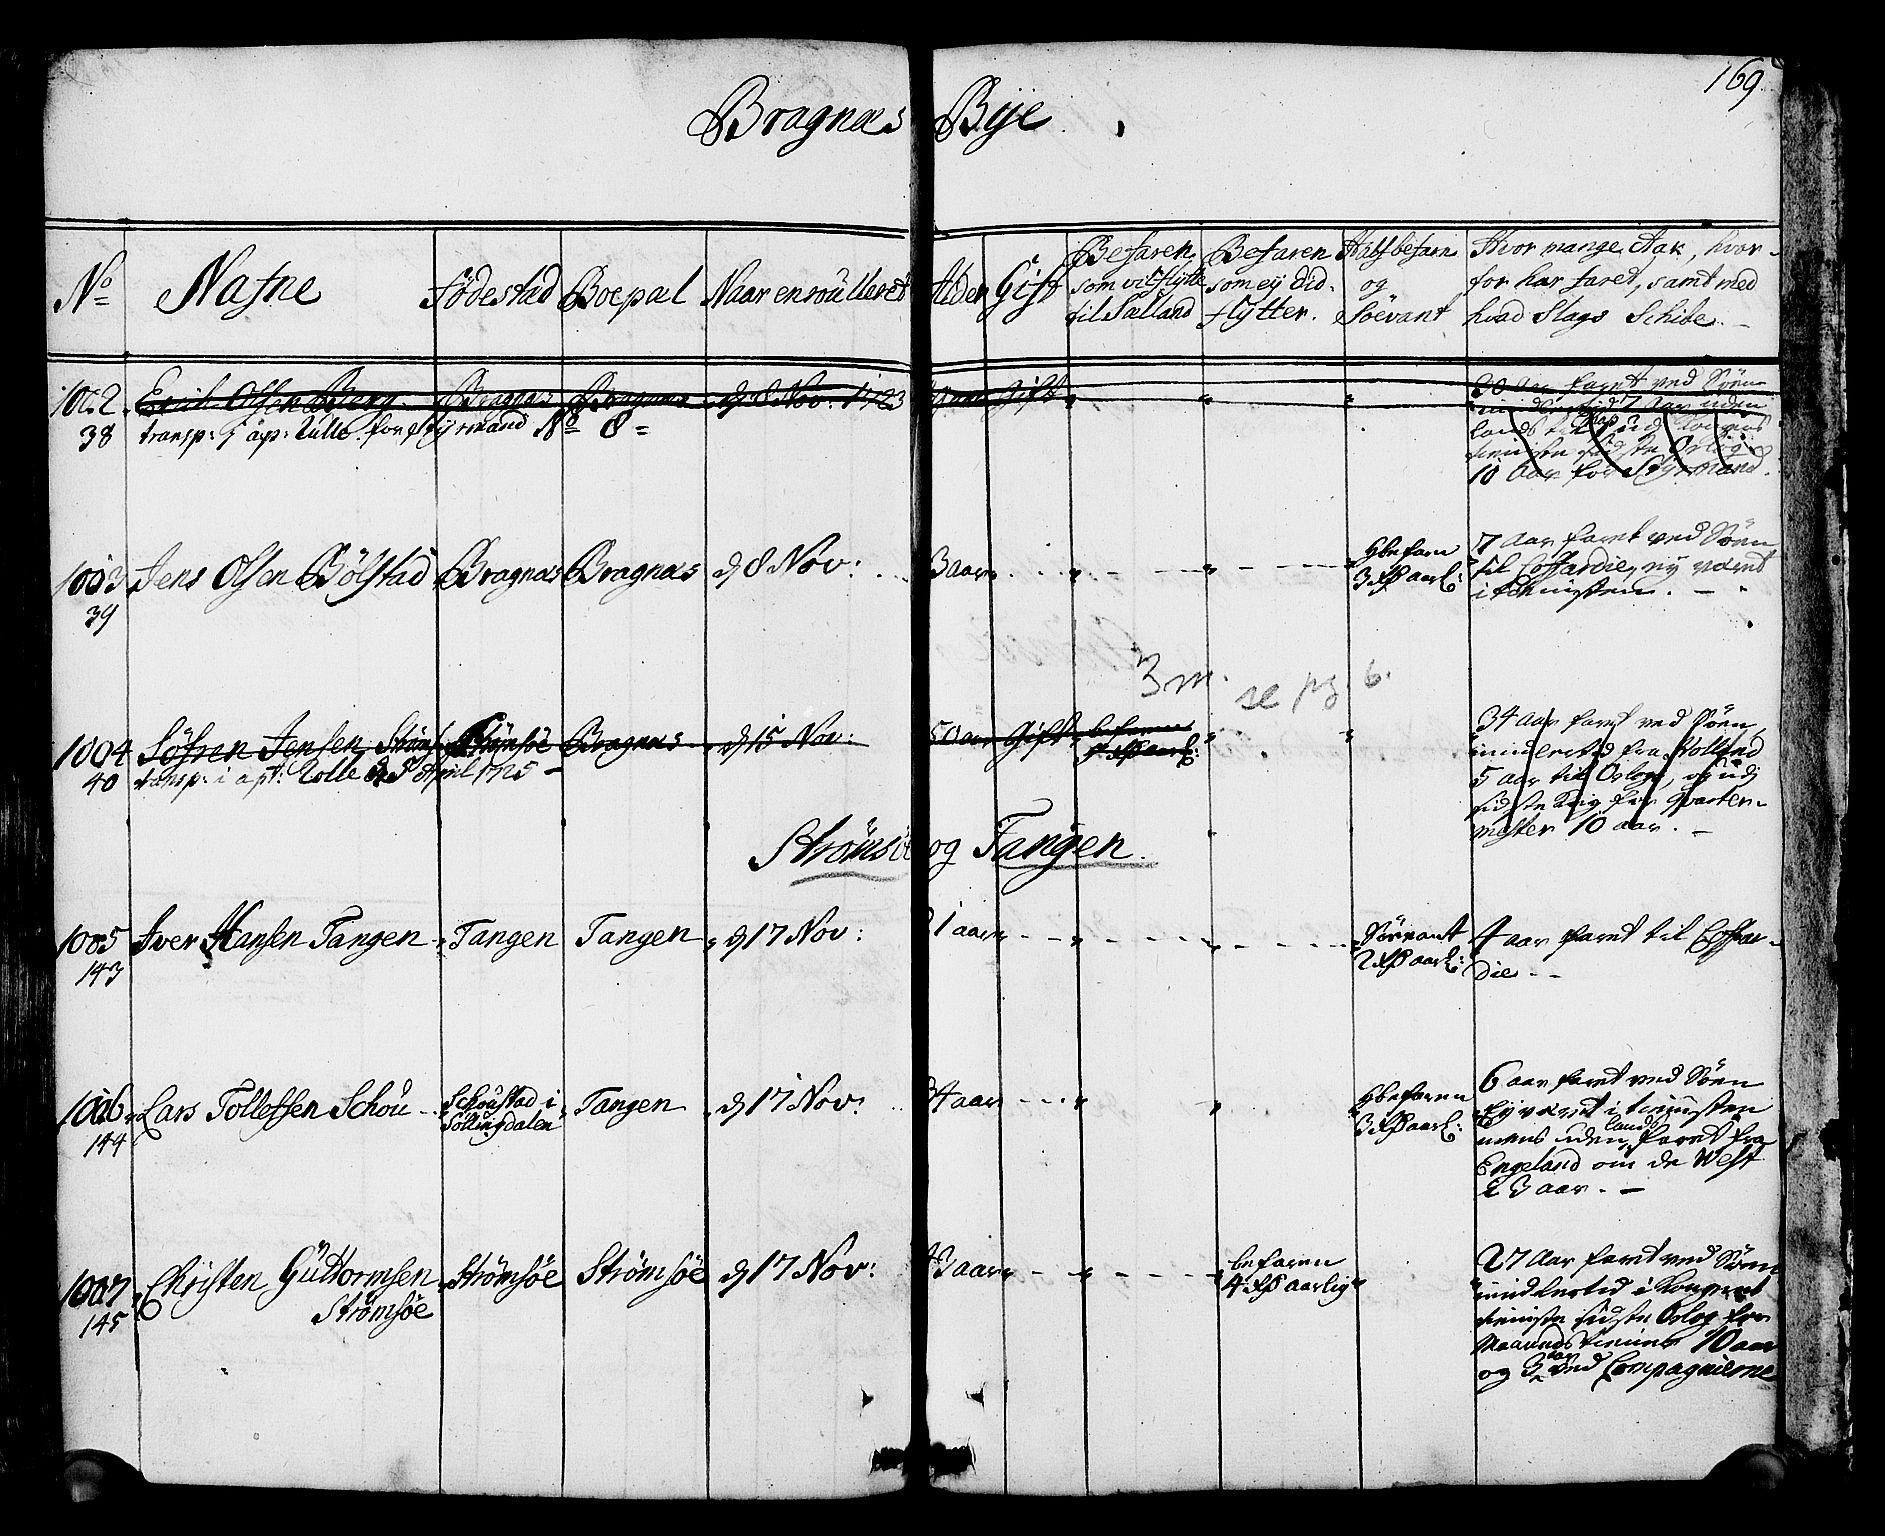 SAKO, Drammen innrulleringsdistrikt, F/Fa/L0002: Hovedrulle, 1723-1726, p. 170